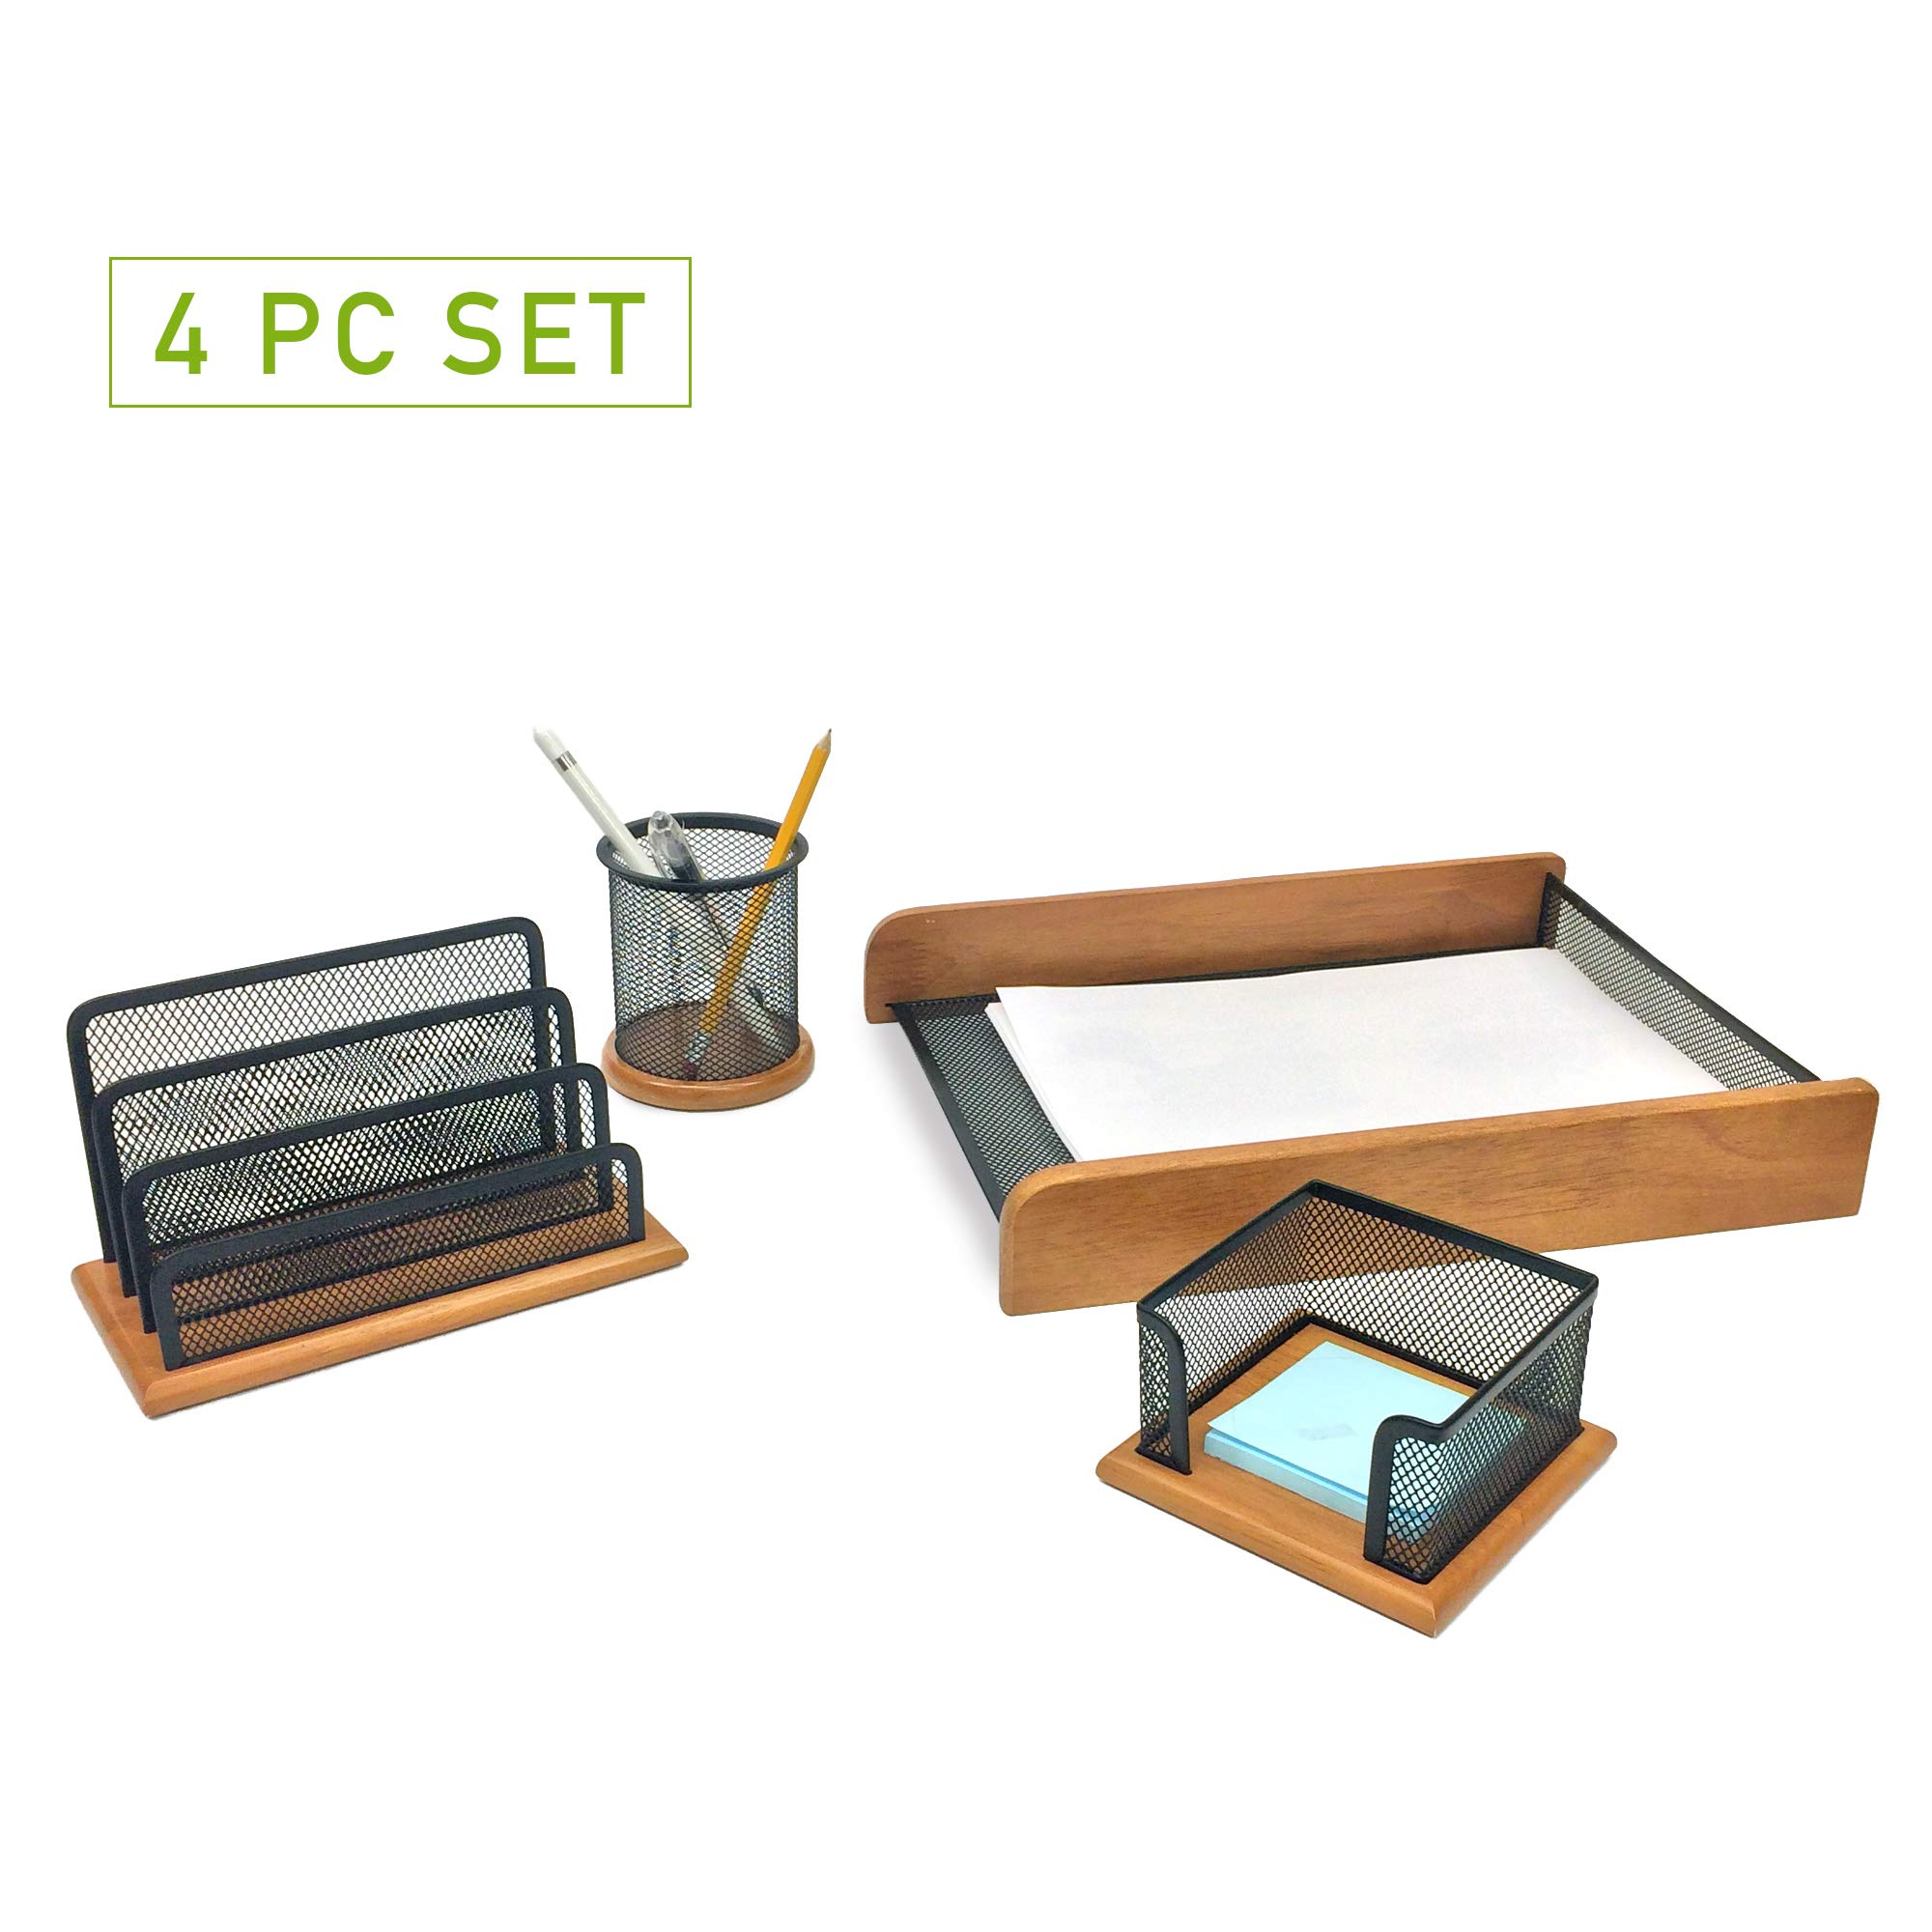 Mind Reader Desk Supplies Organizer Set, Pencil Holder, Document Letter Tray for Papers, Files, Folders, Letters, Memo Holder, Black/Wood